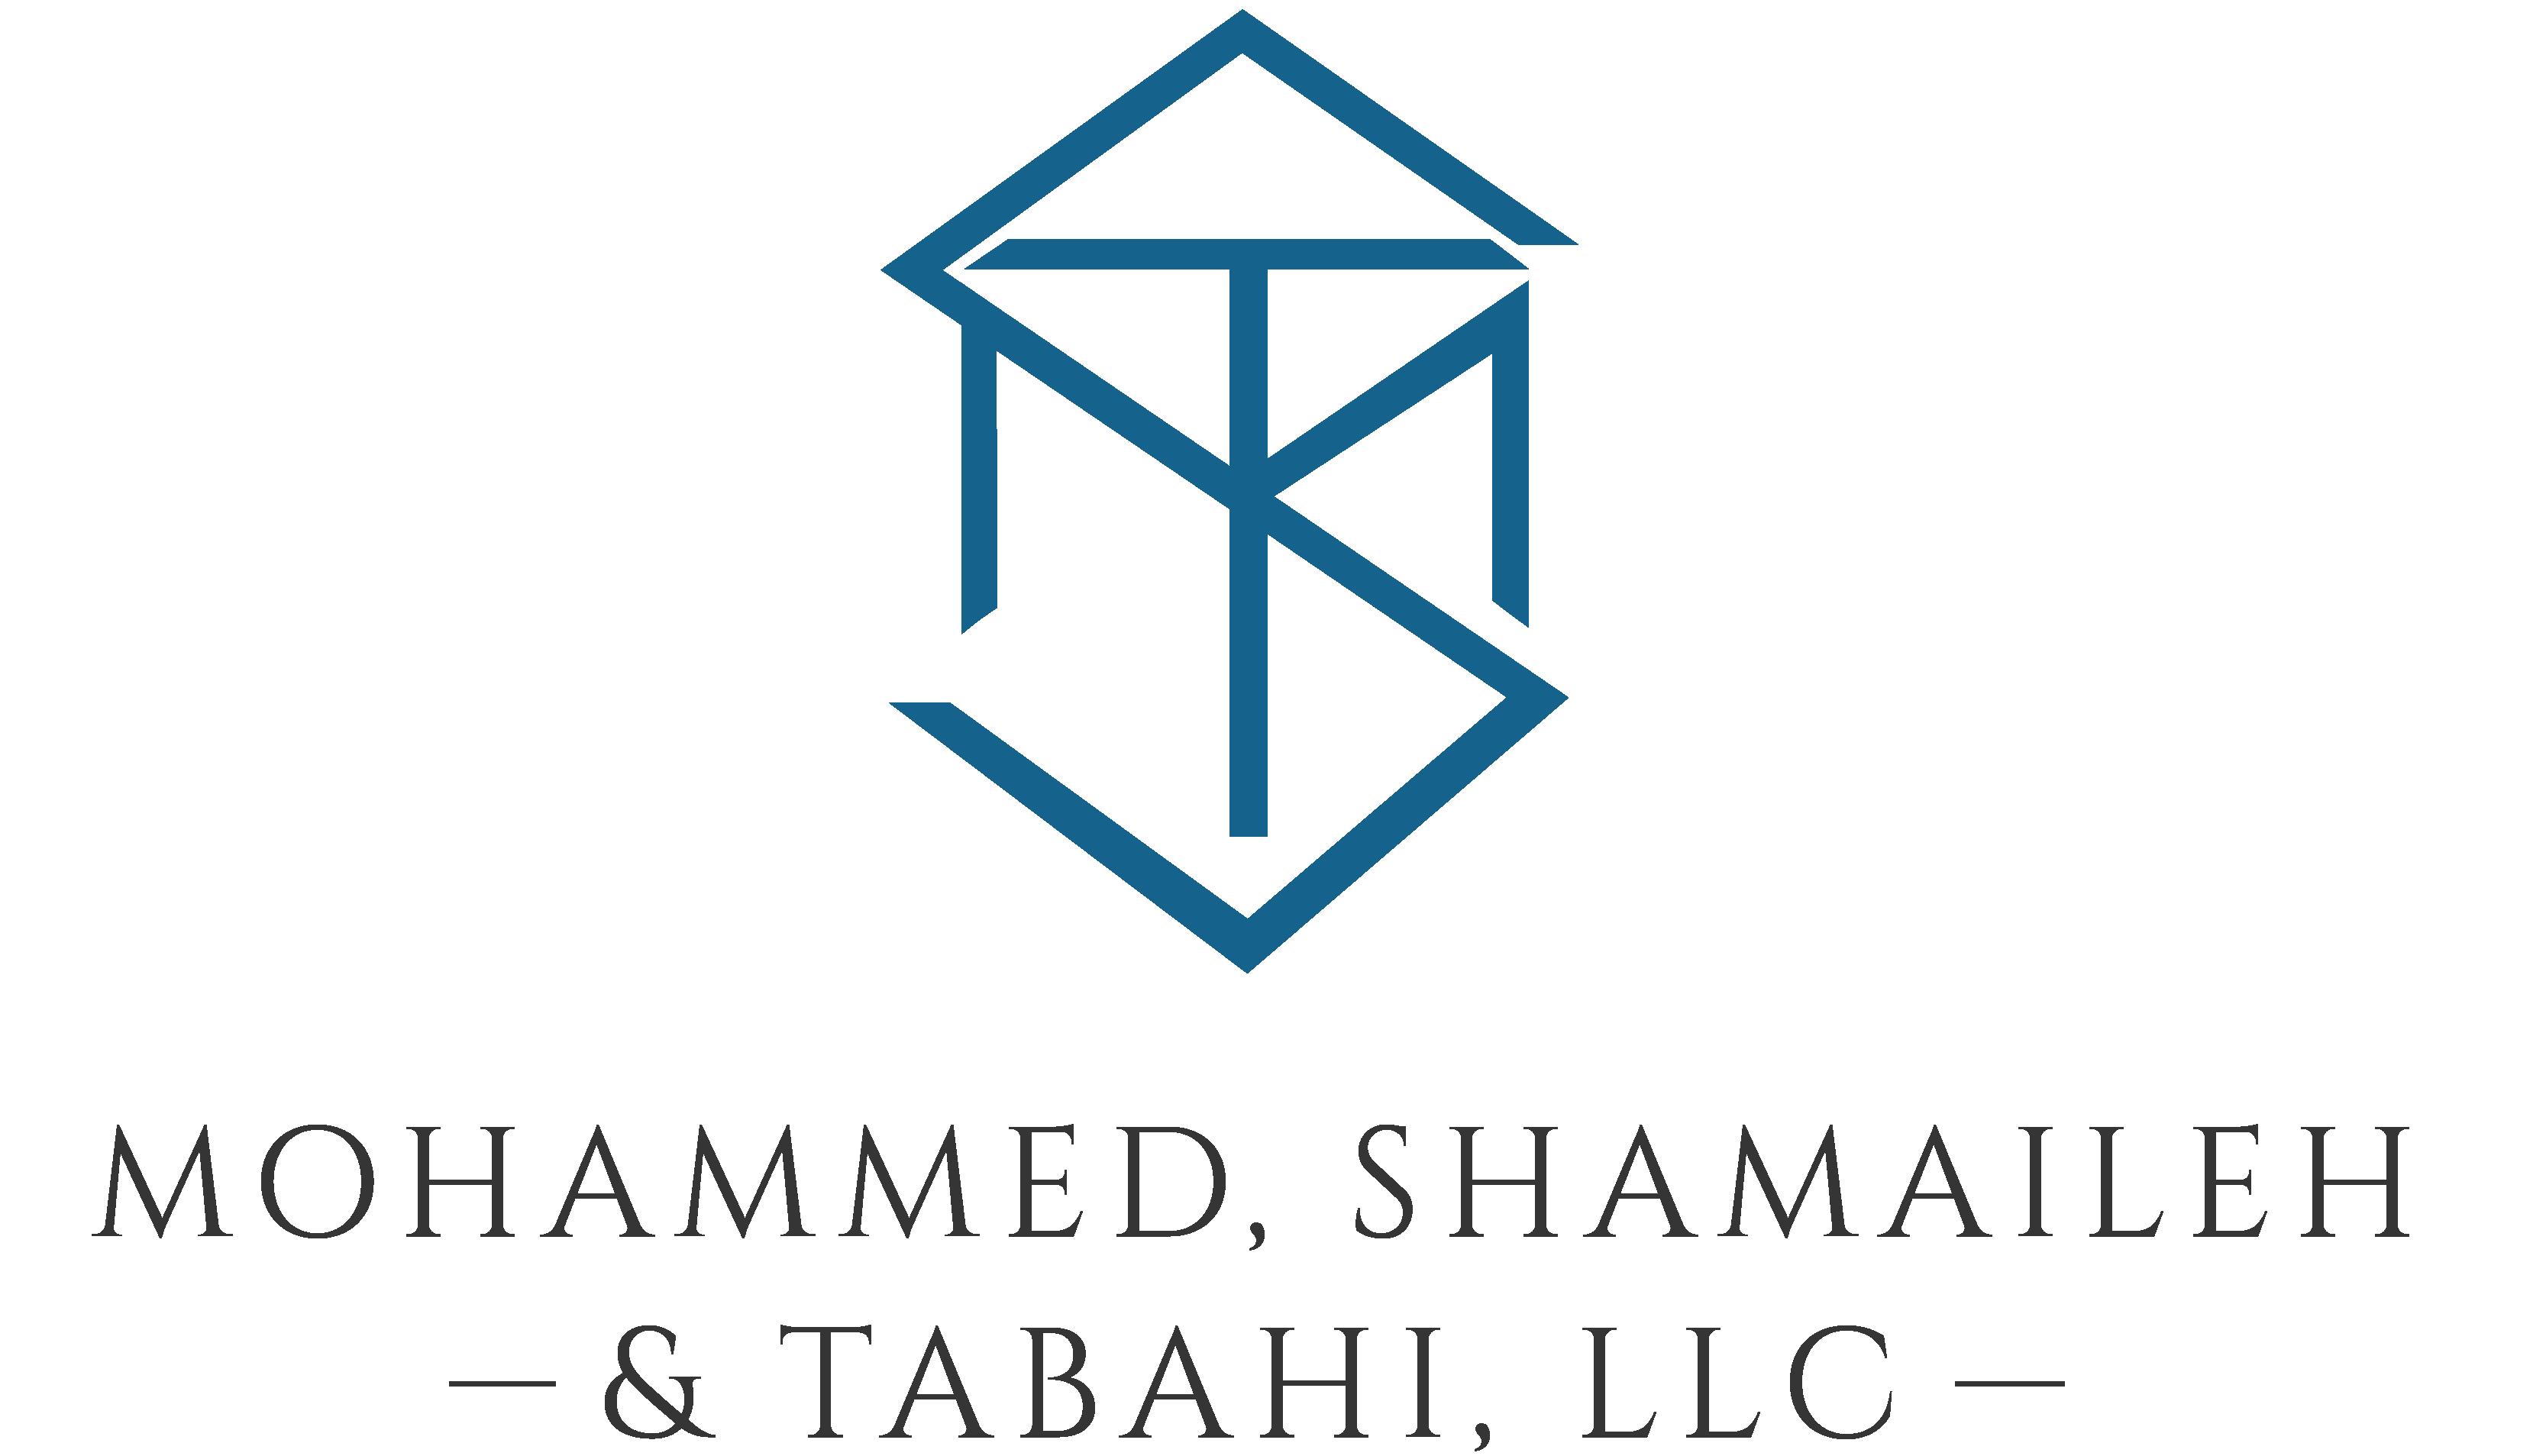 Mohammed, Shamaileh & Tabahi, LLC